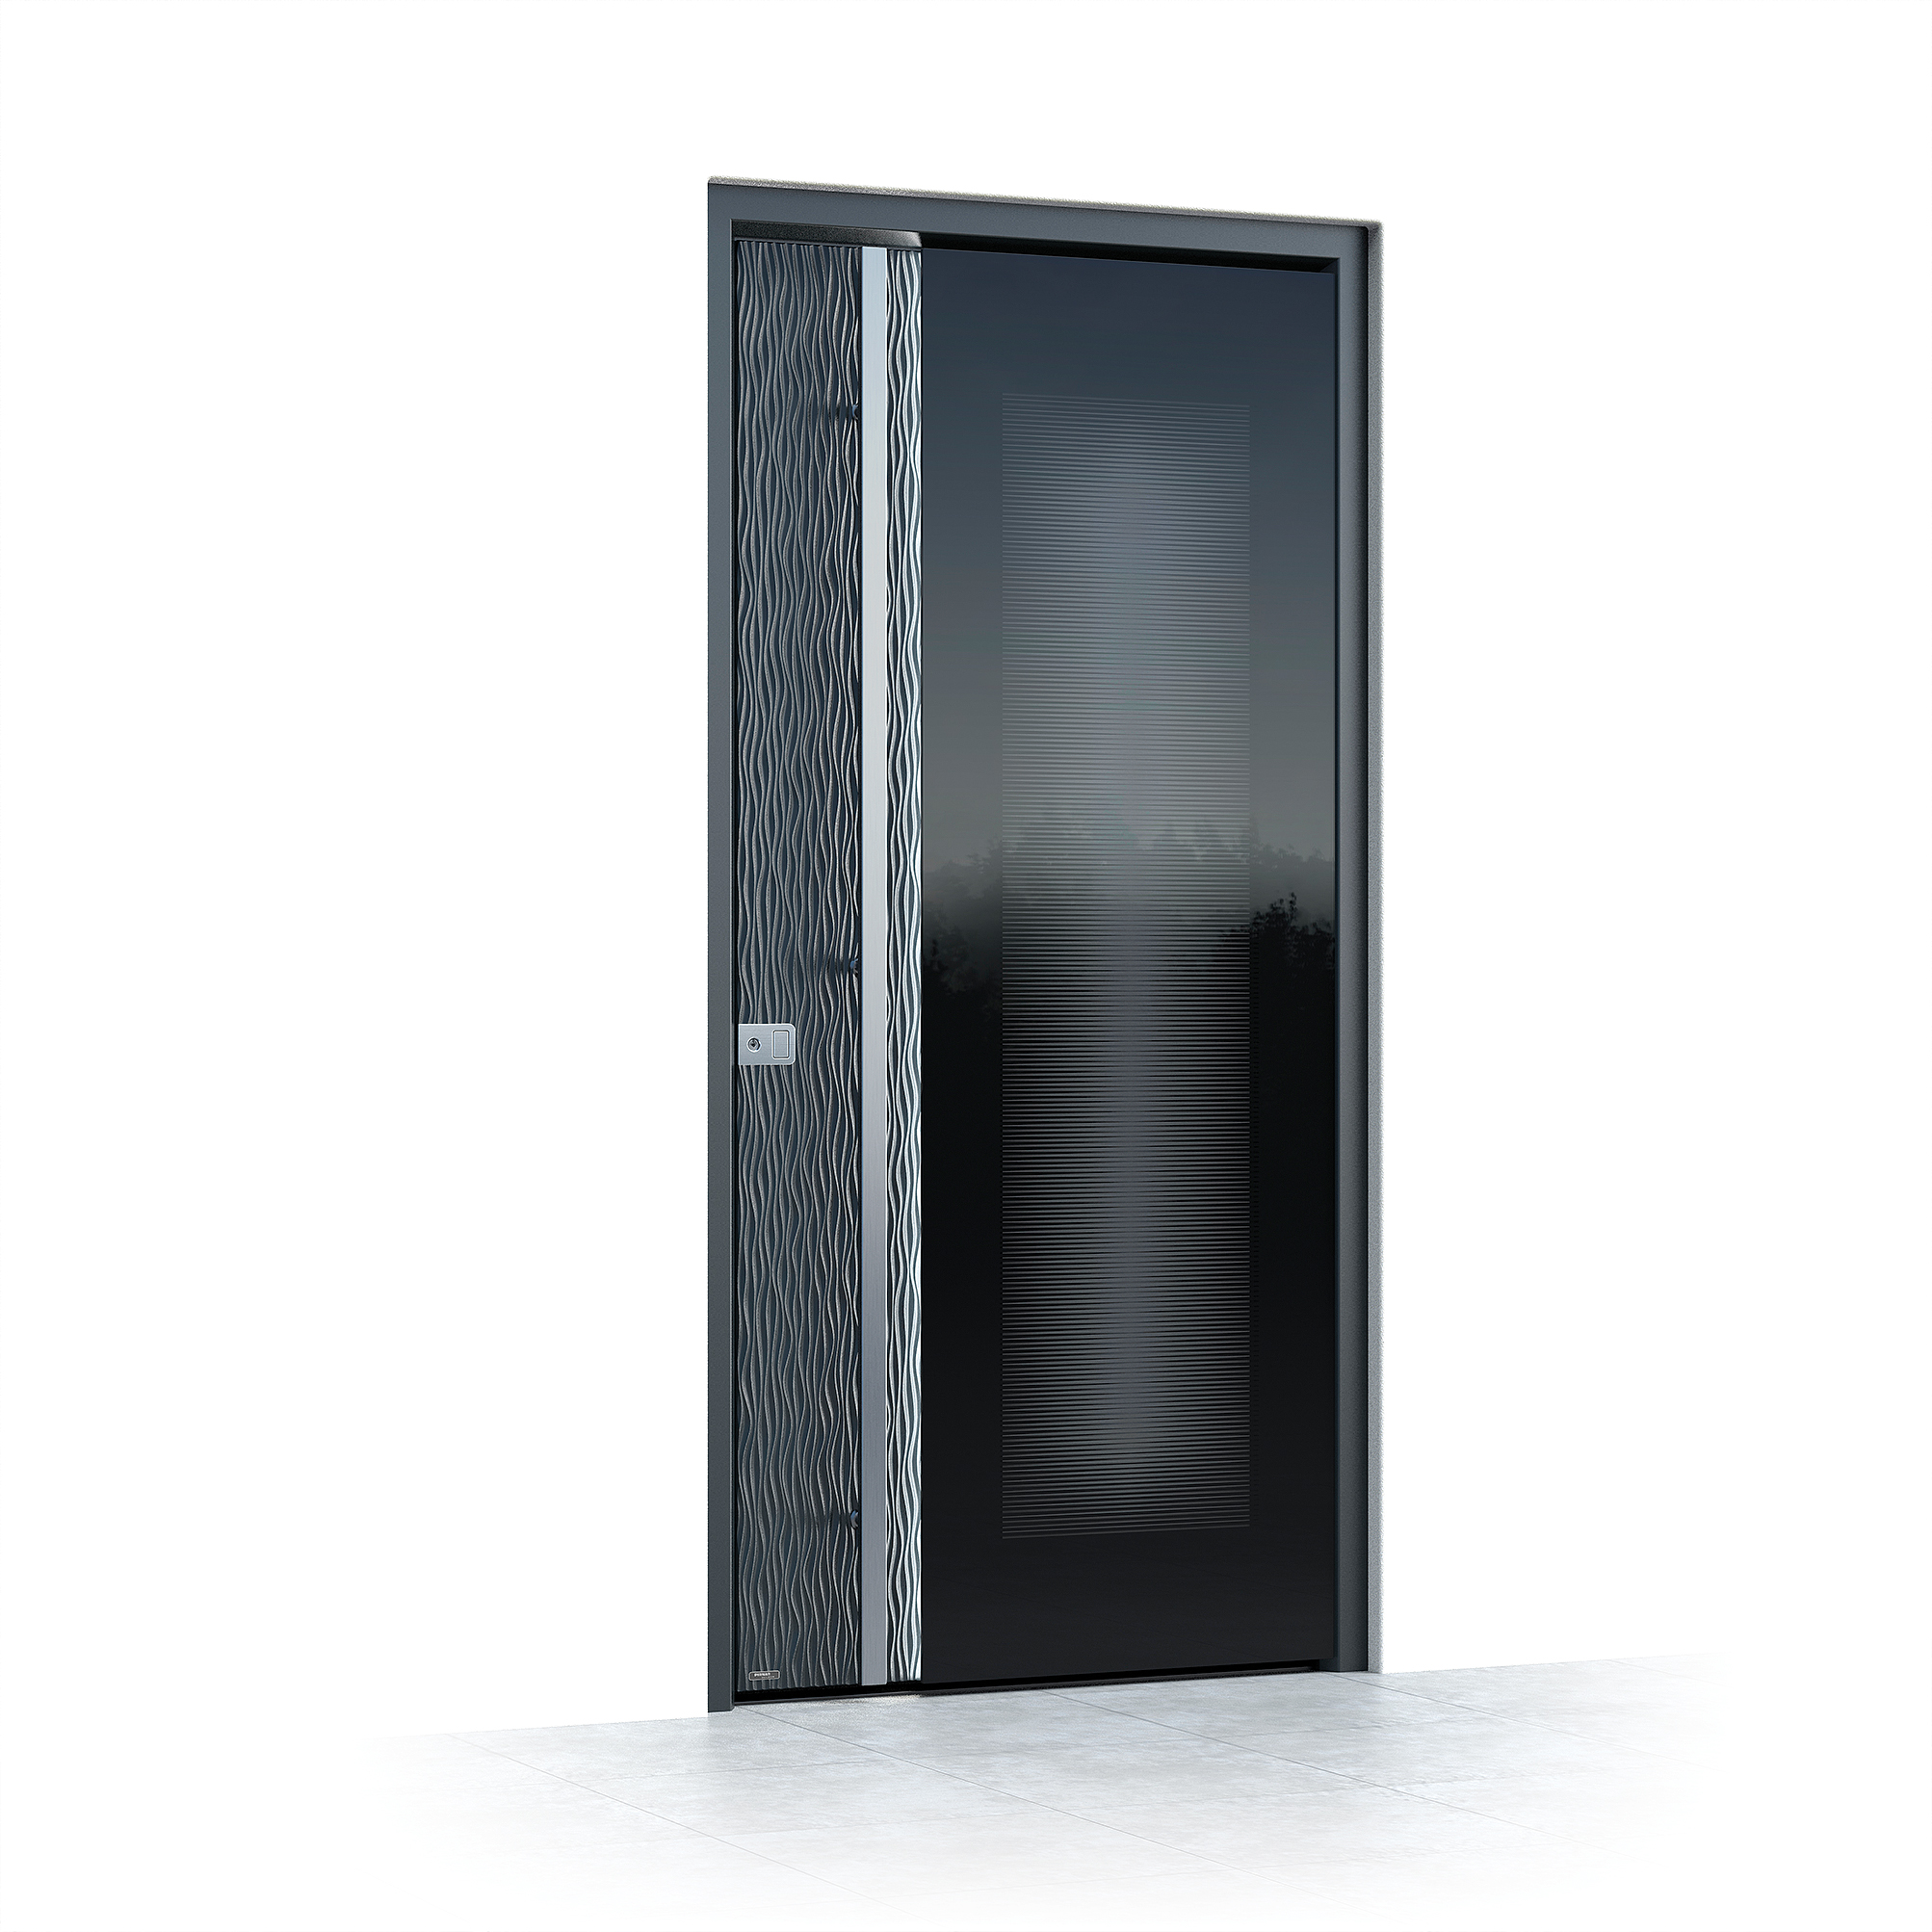 Ușă exterior Pirnar ULTIMUM MULTILEVEL 523